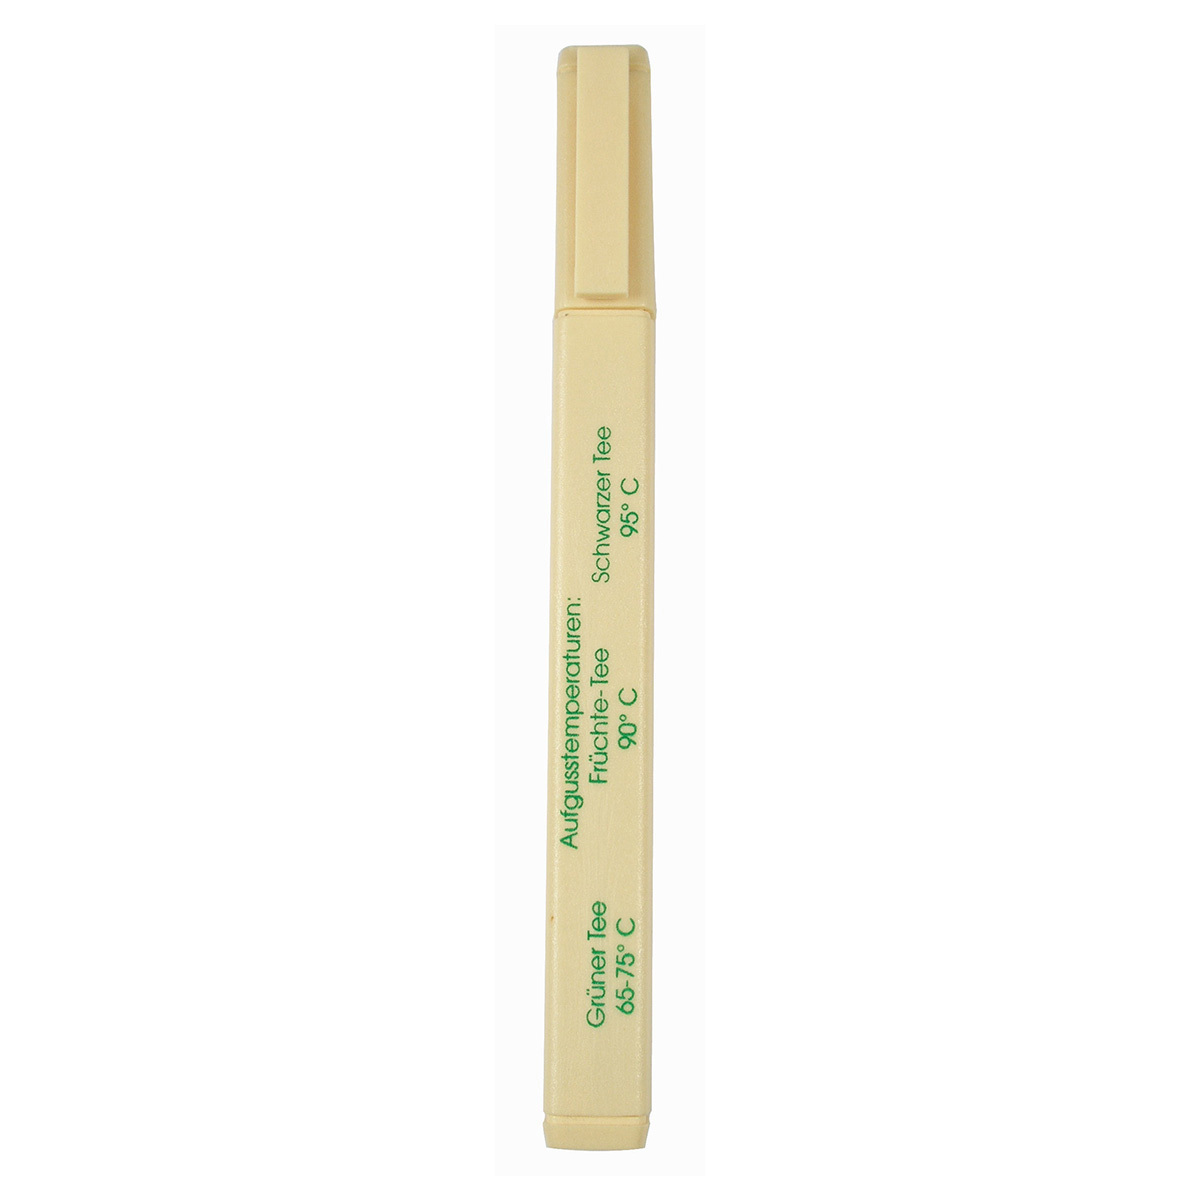 14-2013-analoges-teethermometer-ansicht-1200x1200px.jpg